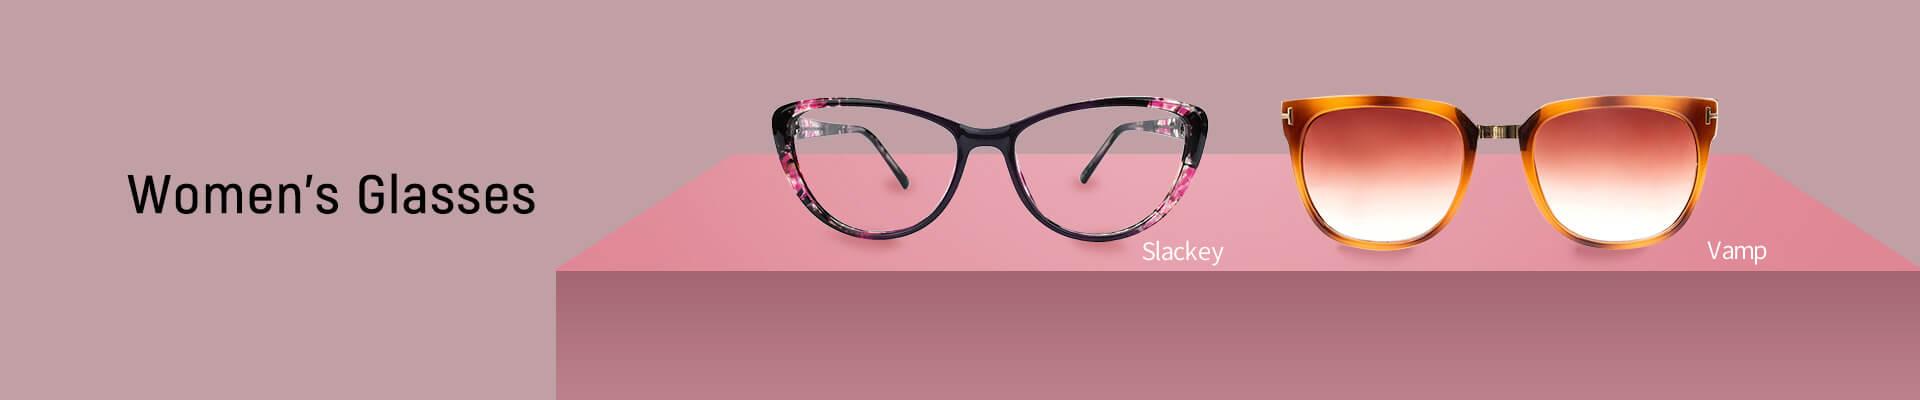 Women's glasses category